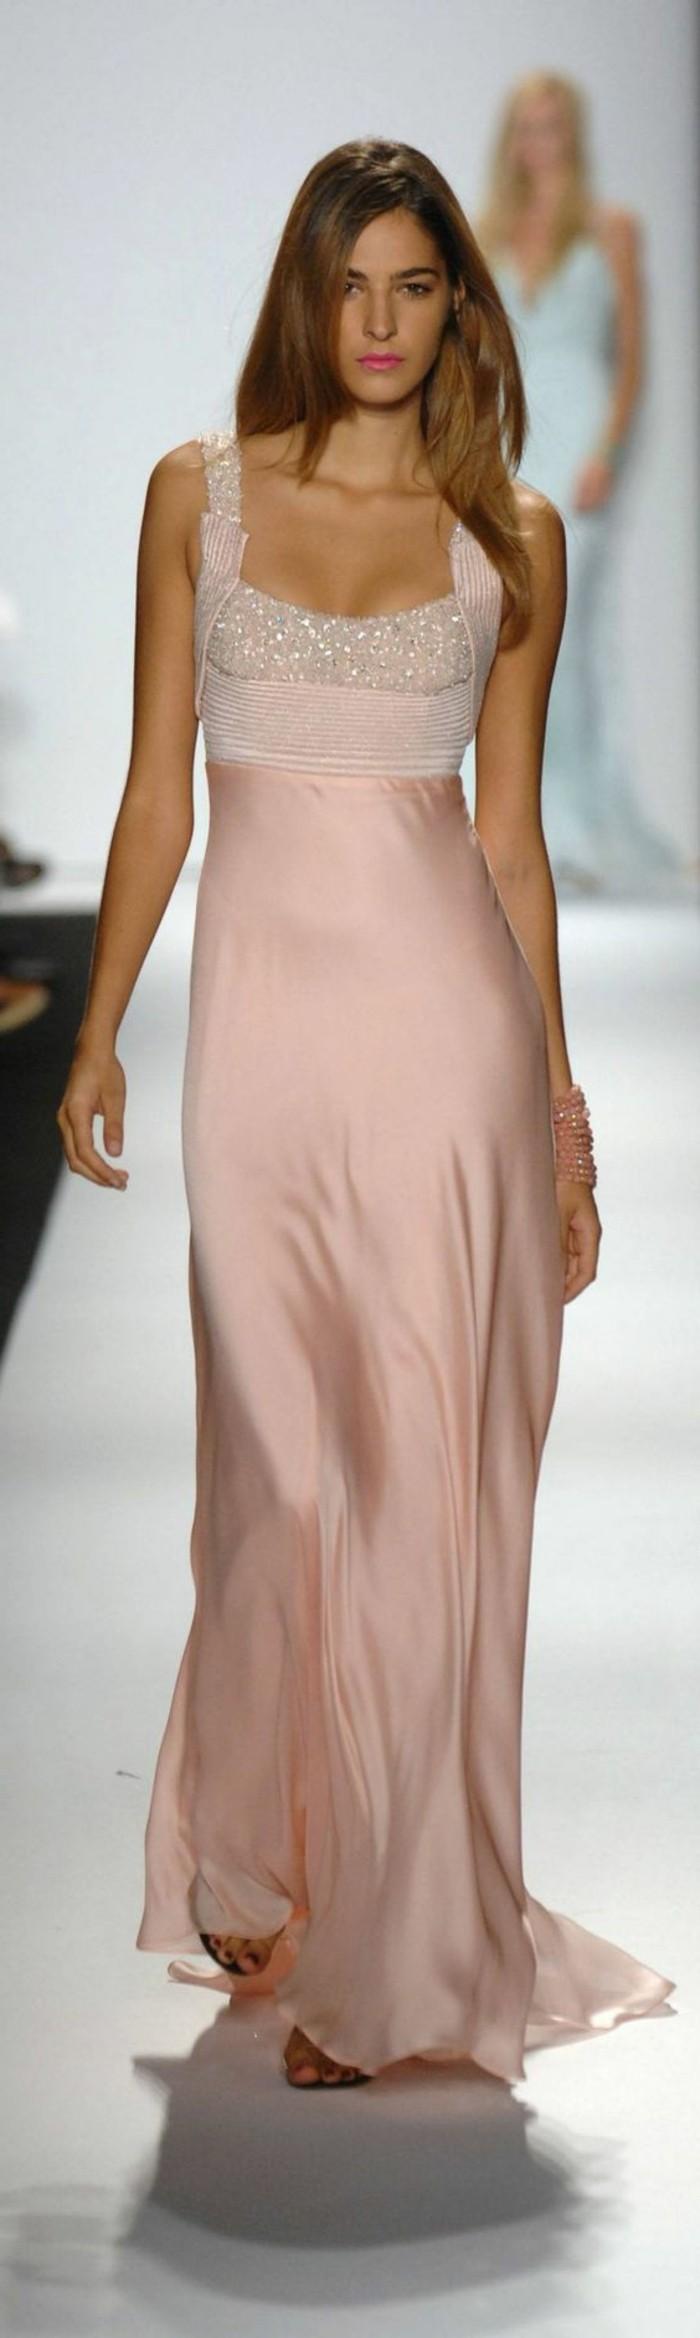 Elegante-Kleider-mit-träger-haute-couture